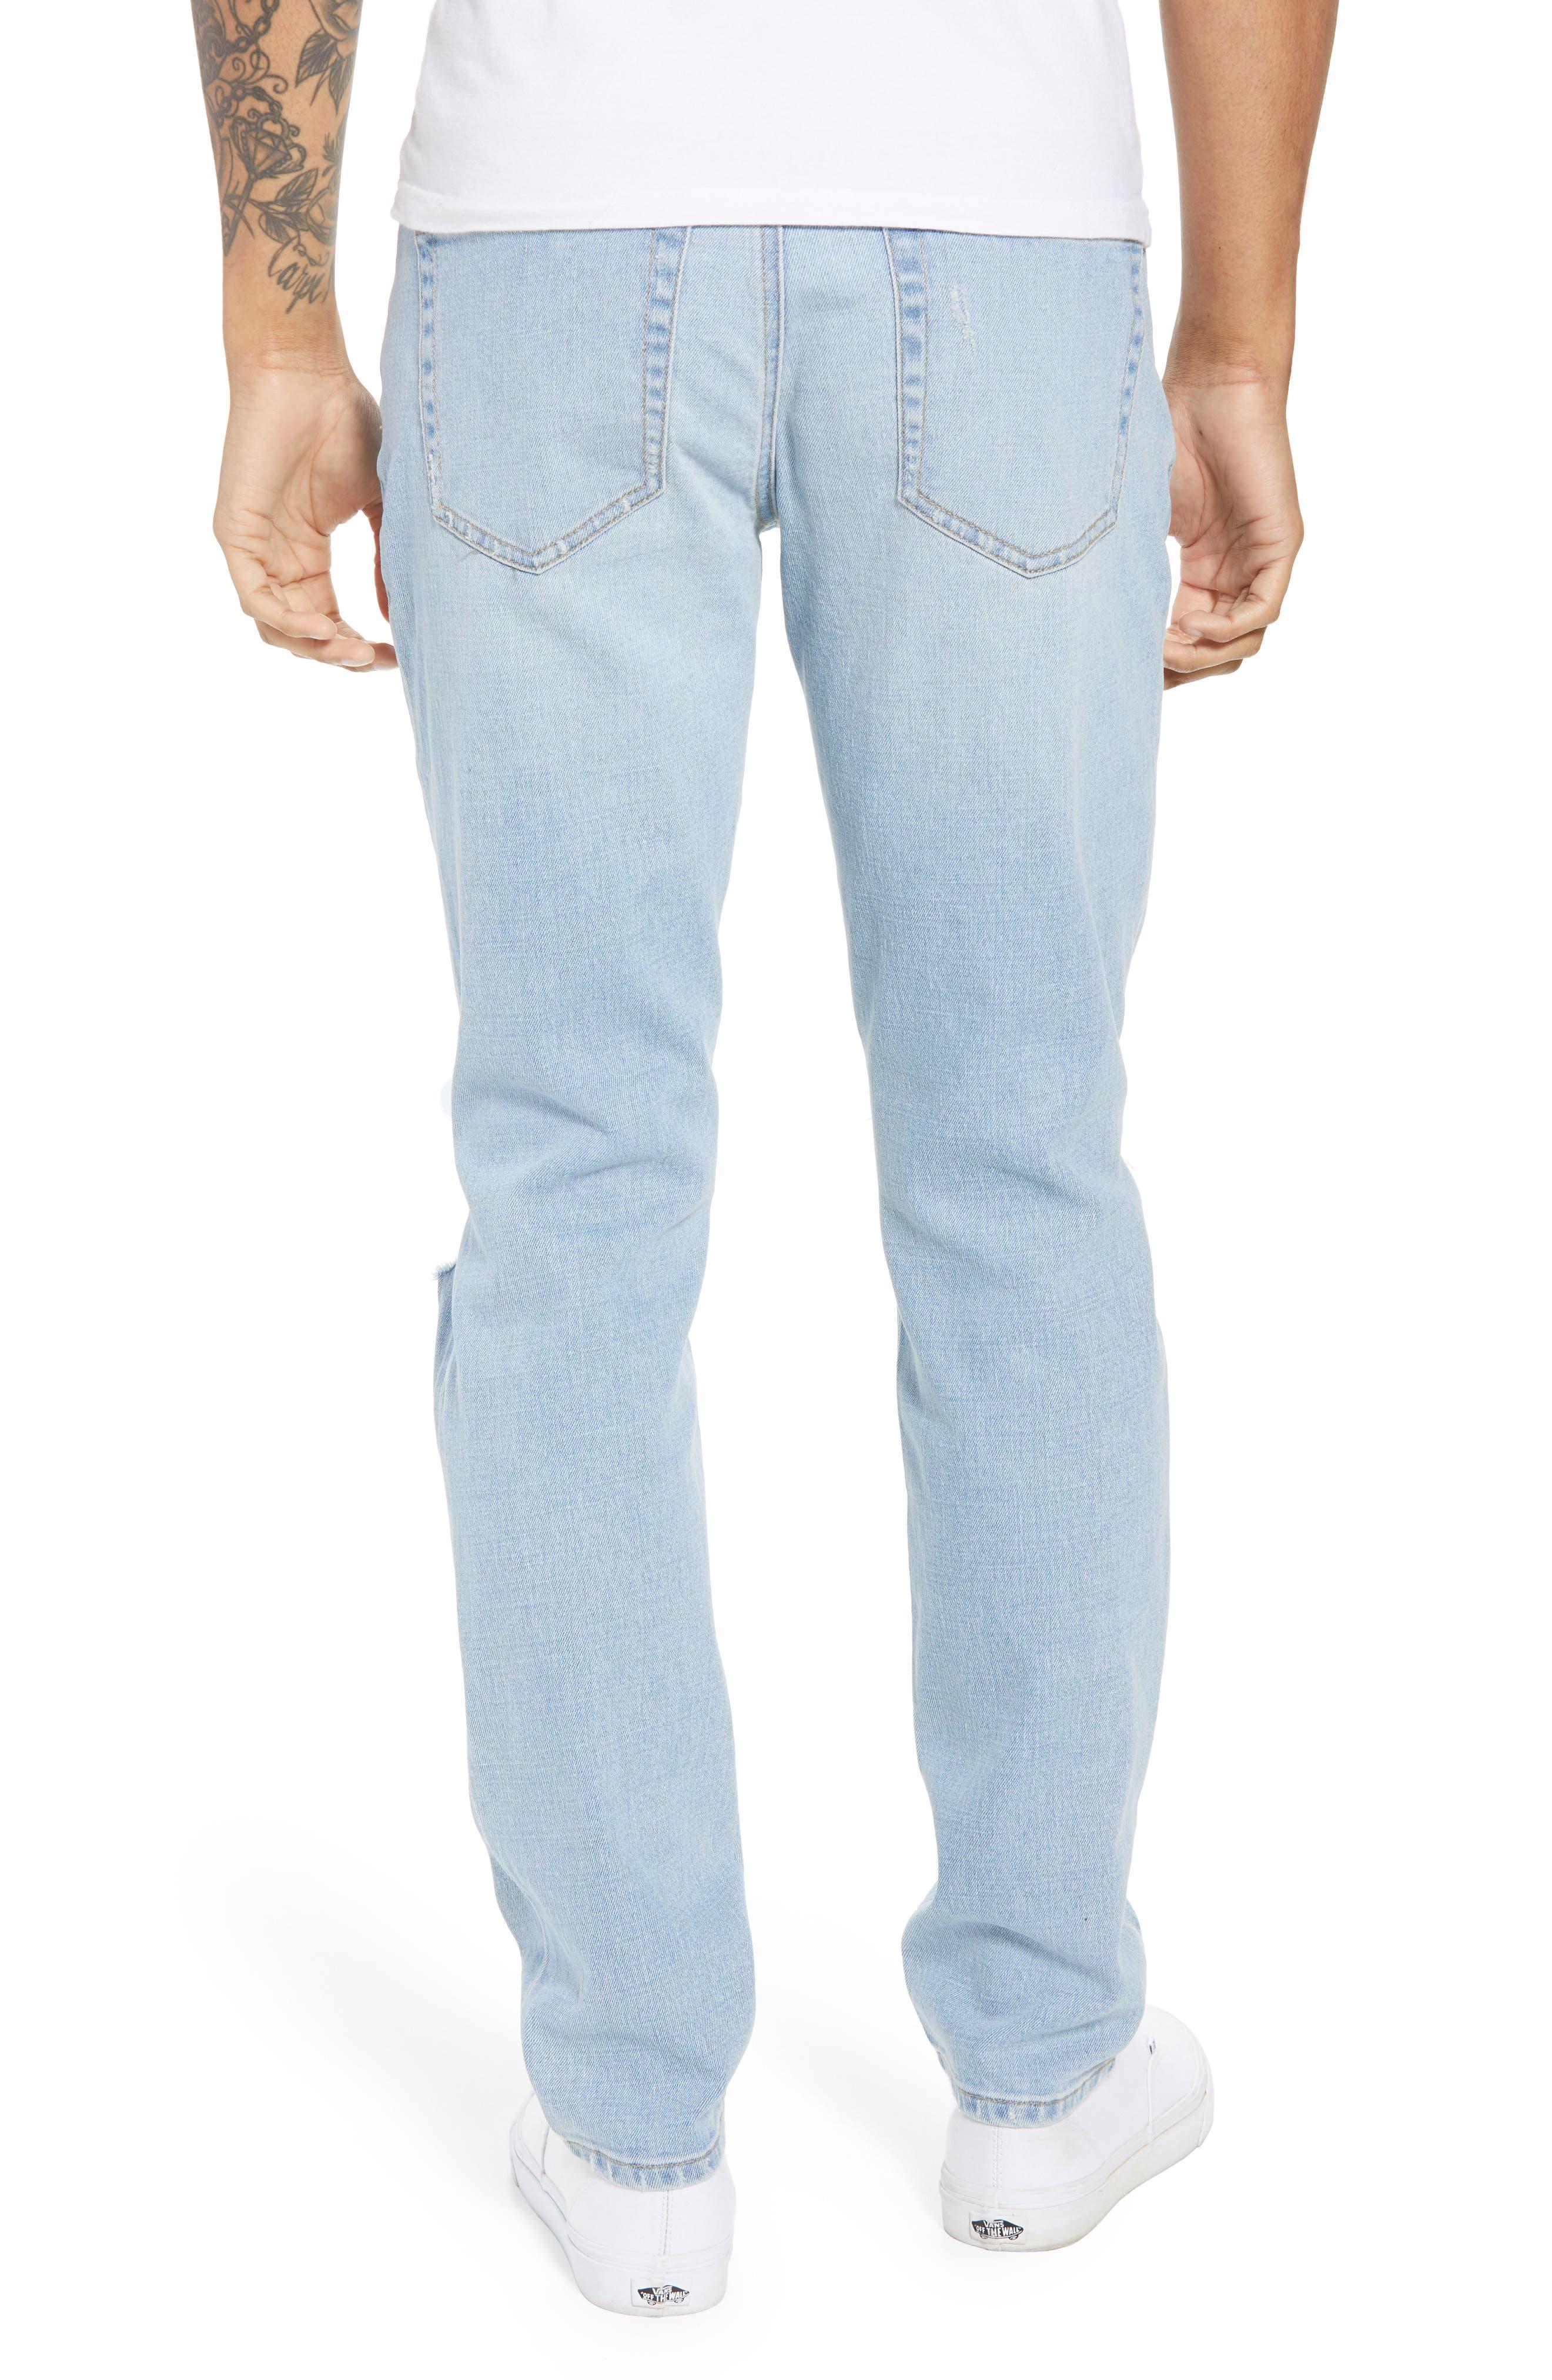 Ripped Skinny Jeans,                             Alternate thumbnail 2, color,                             BLUE CORGAN WASH